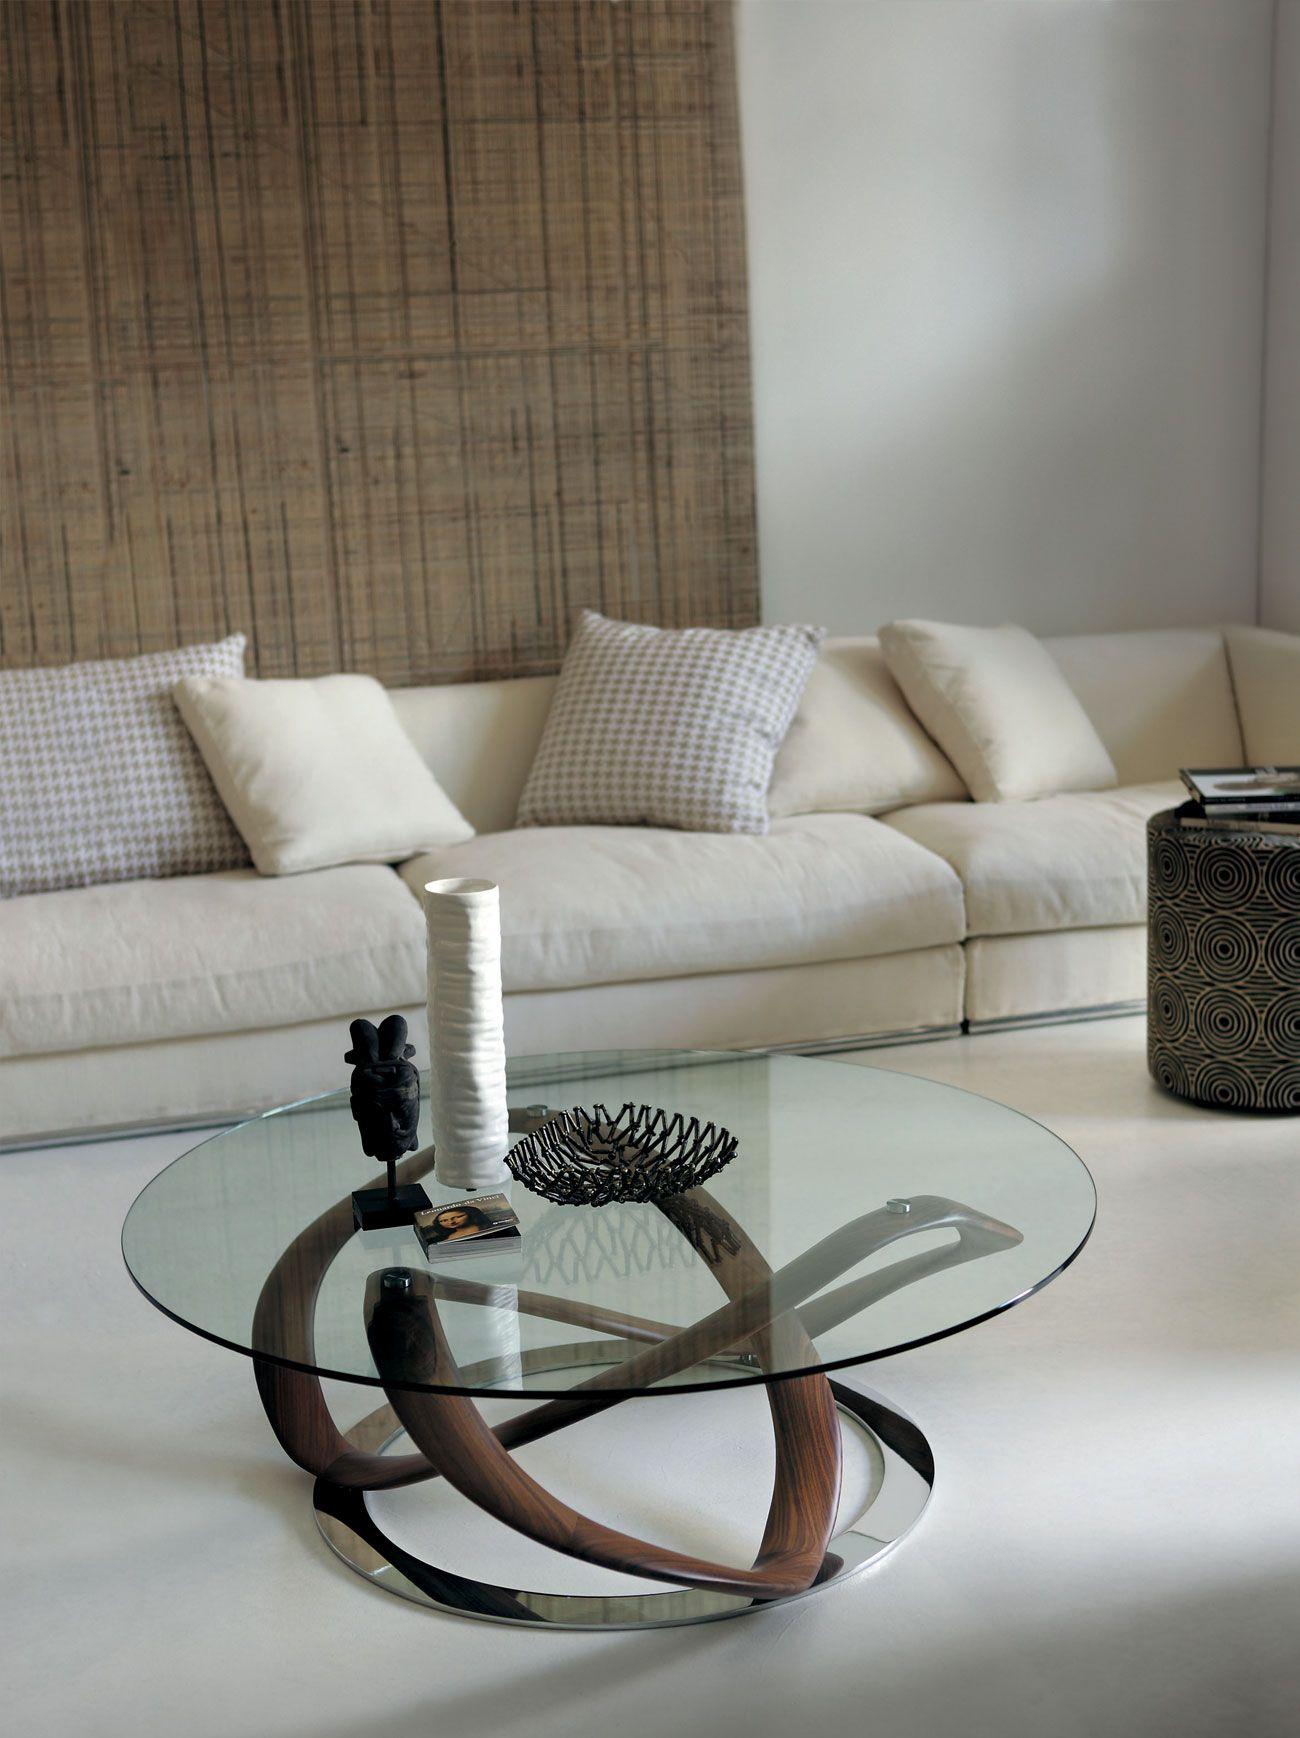 Infinity coffee table design stefano bigi for porada stefano infinity coffee table design stefano bigi for porada geotapseo Image collections